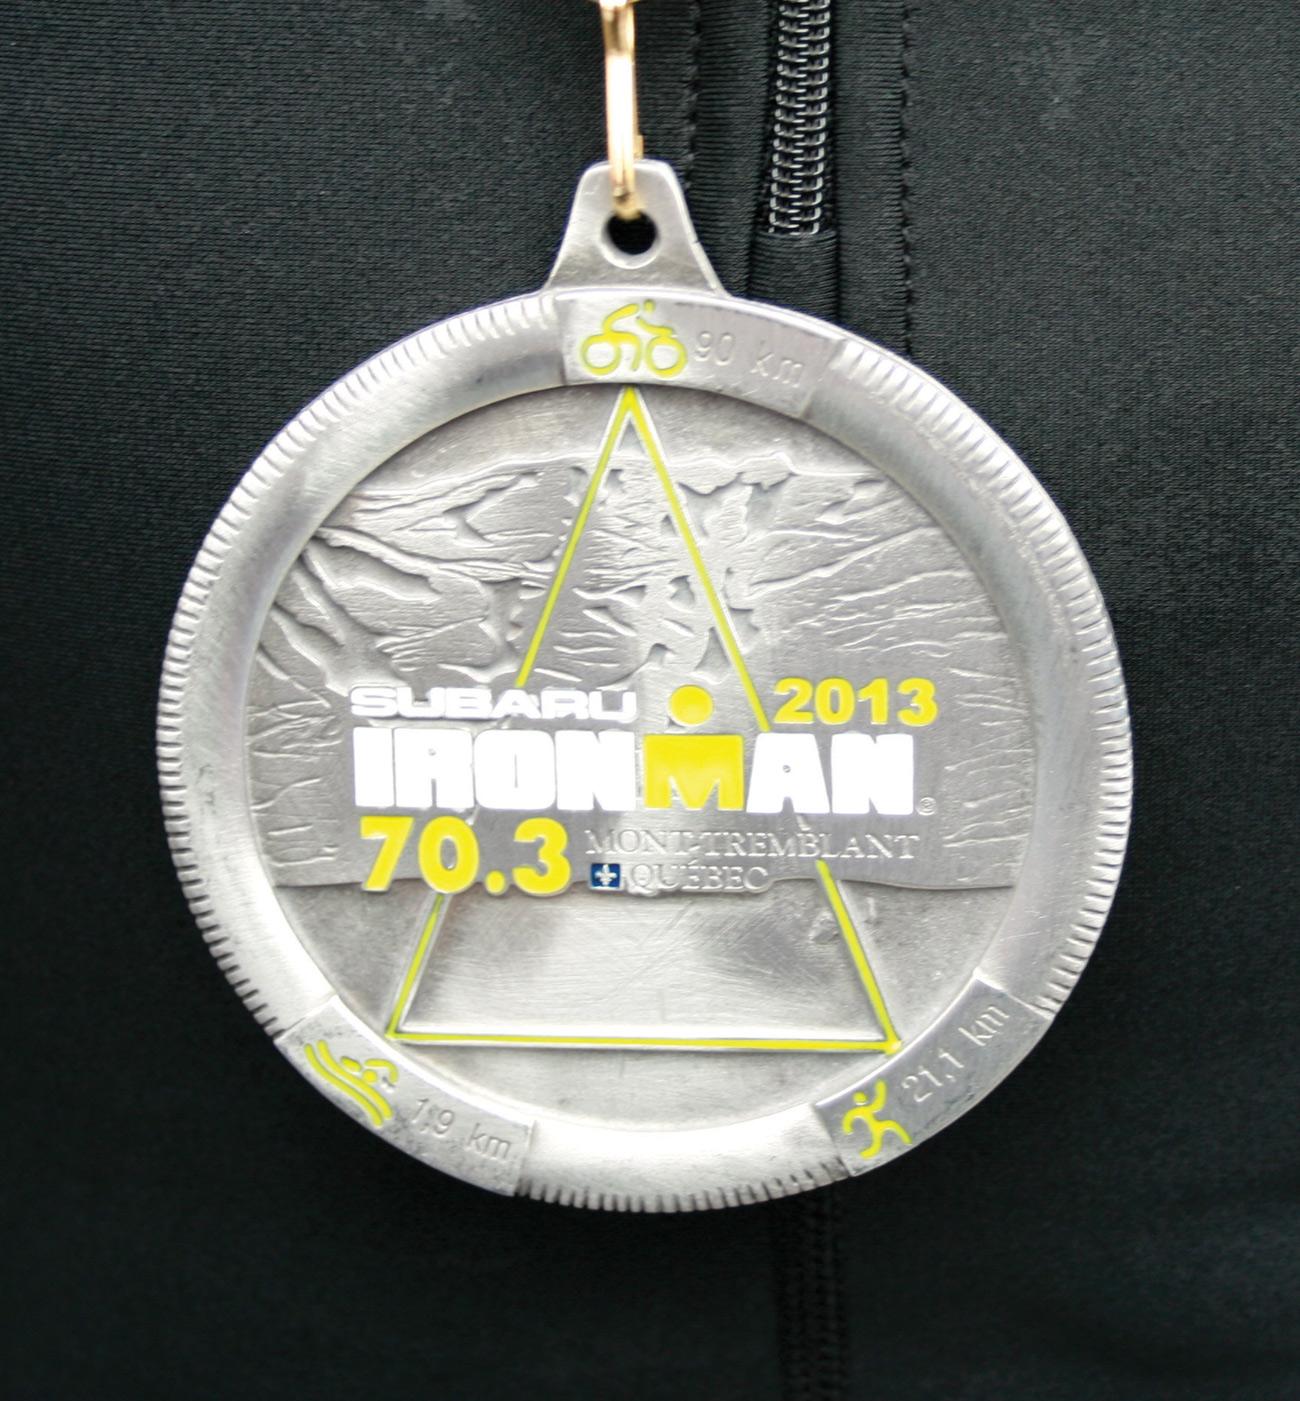 m12-sport-championnat-nord-americain-ironman-mont-tremblant-2013-ironman-north-america-championship-01